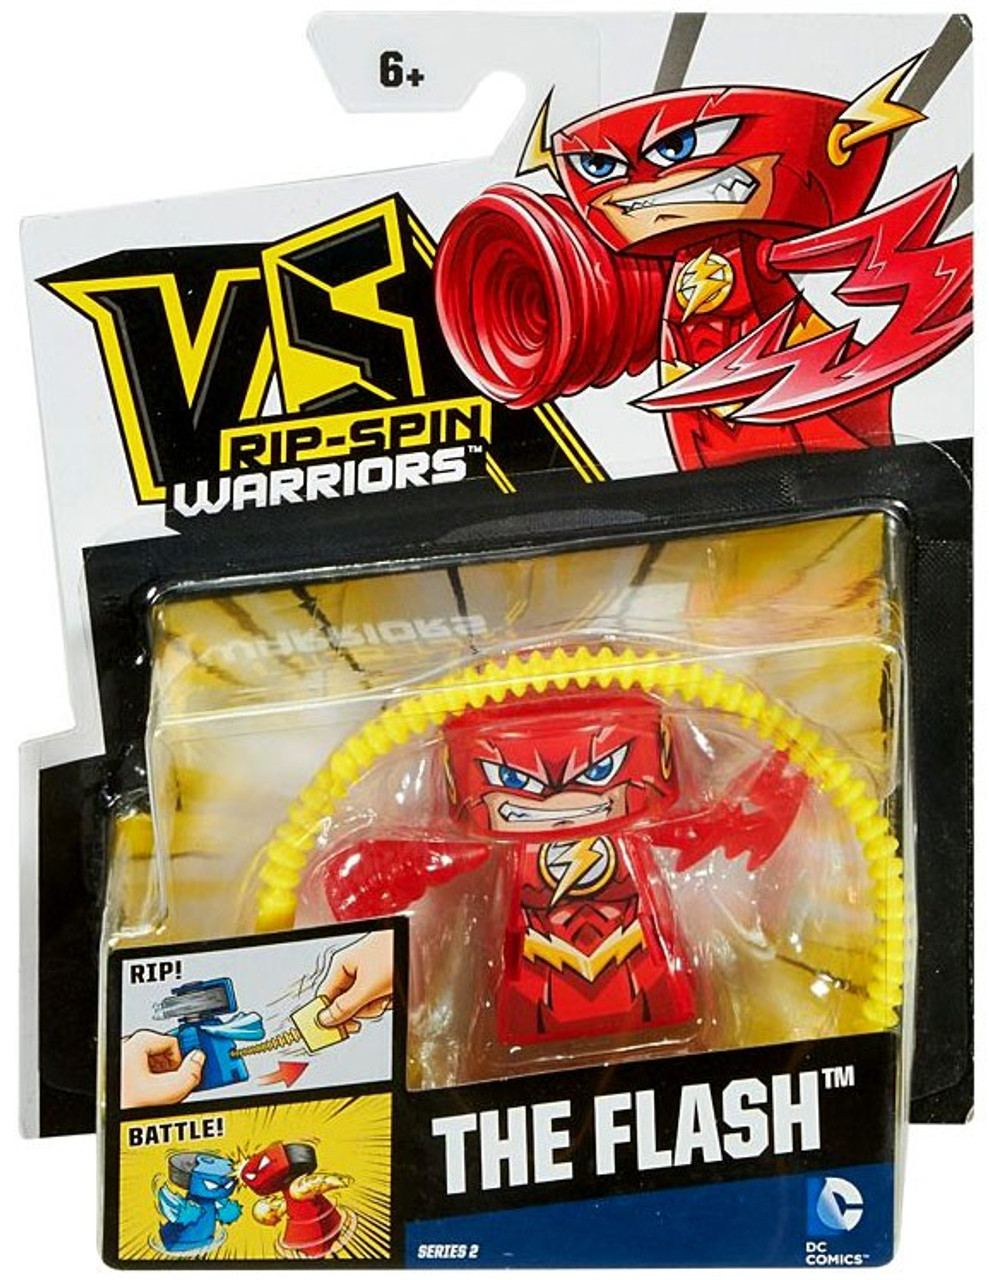 NEWVS Rip-Spin Warriors Iron Man action FigureMarvelDC Comics